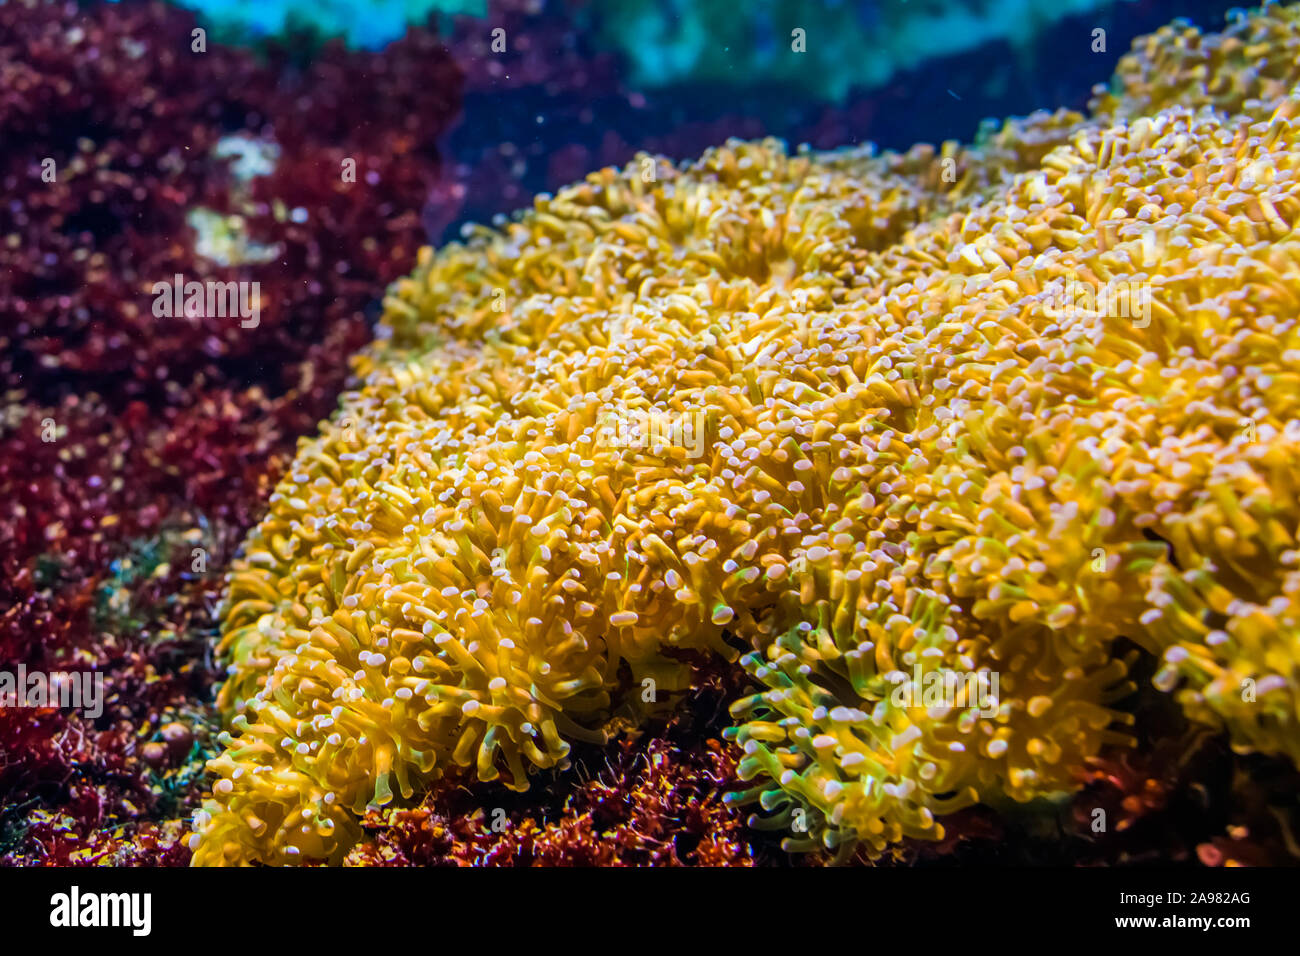 euphyllia sea anemone bed, stony coral specie, popular aquarium pet in aquaculture, marine life background Stock Photo